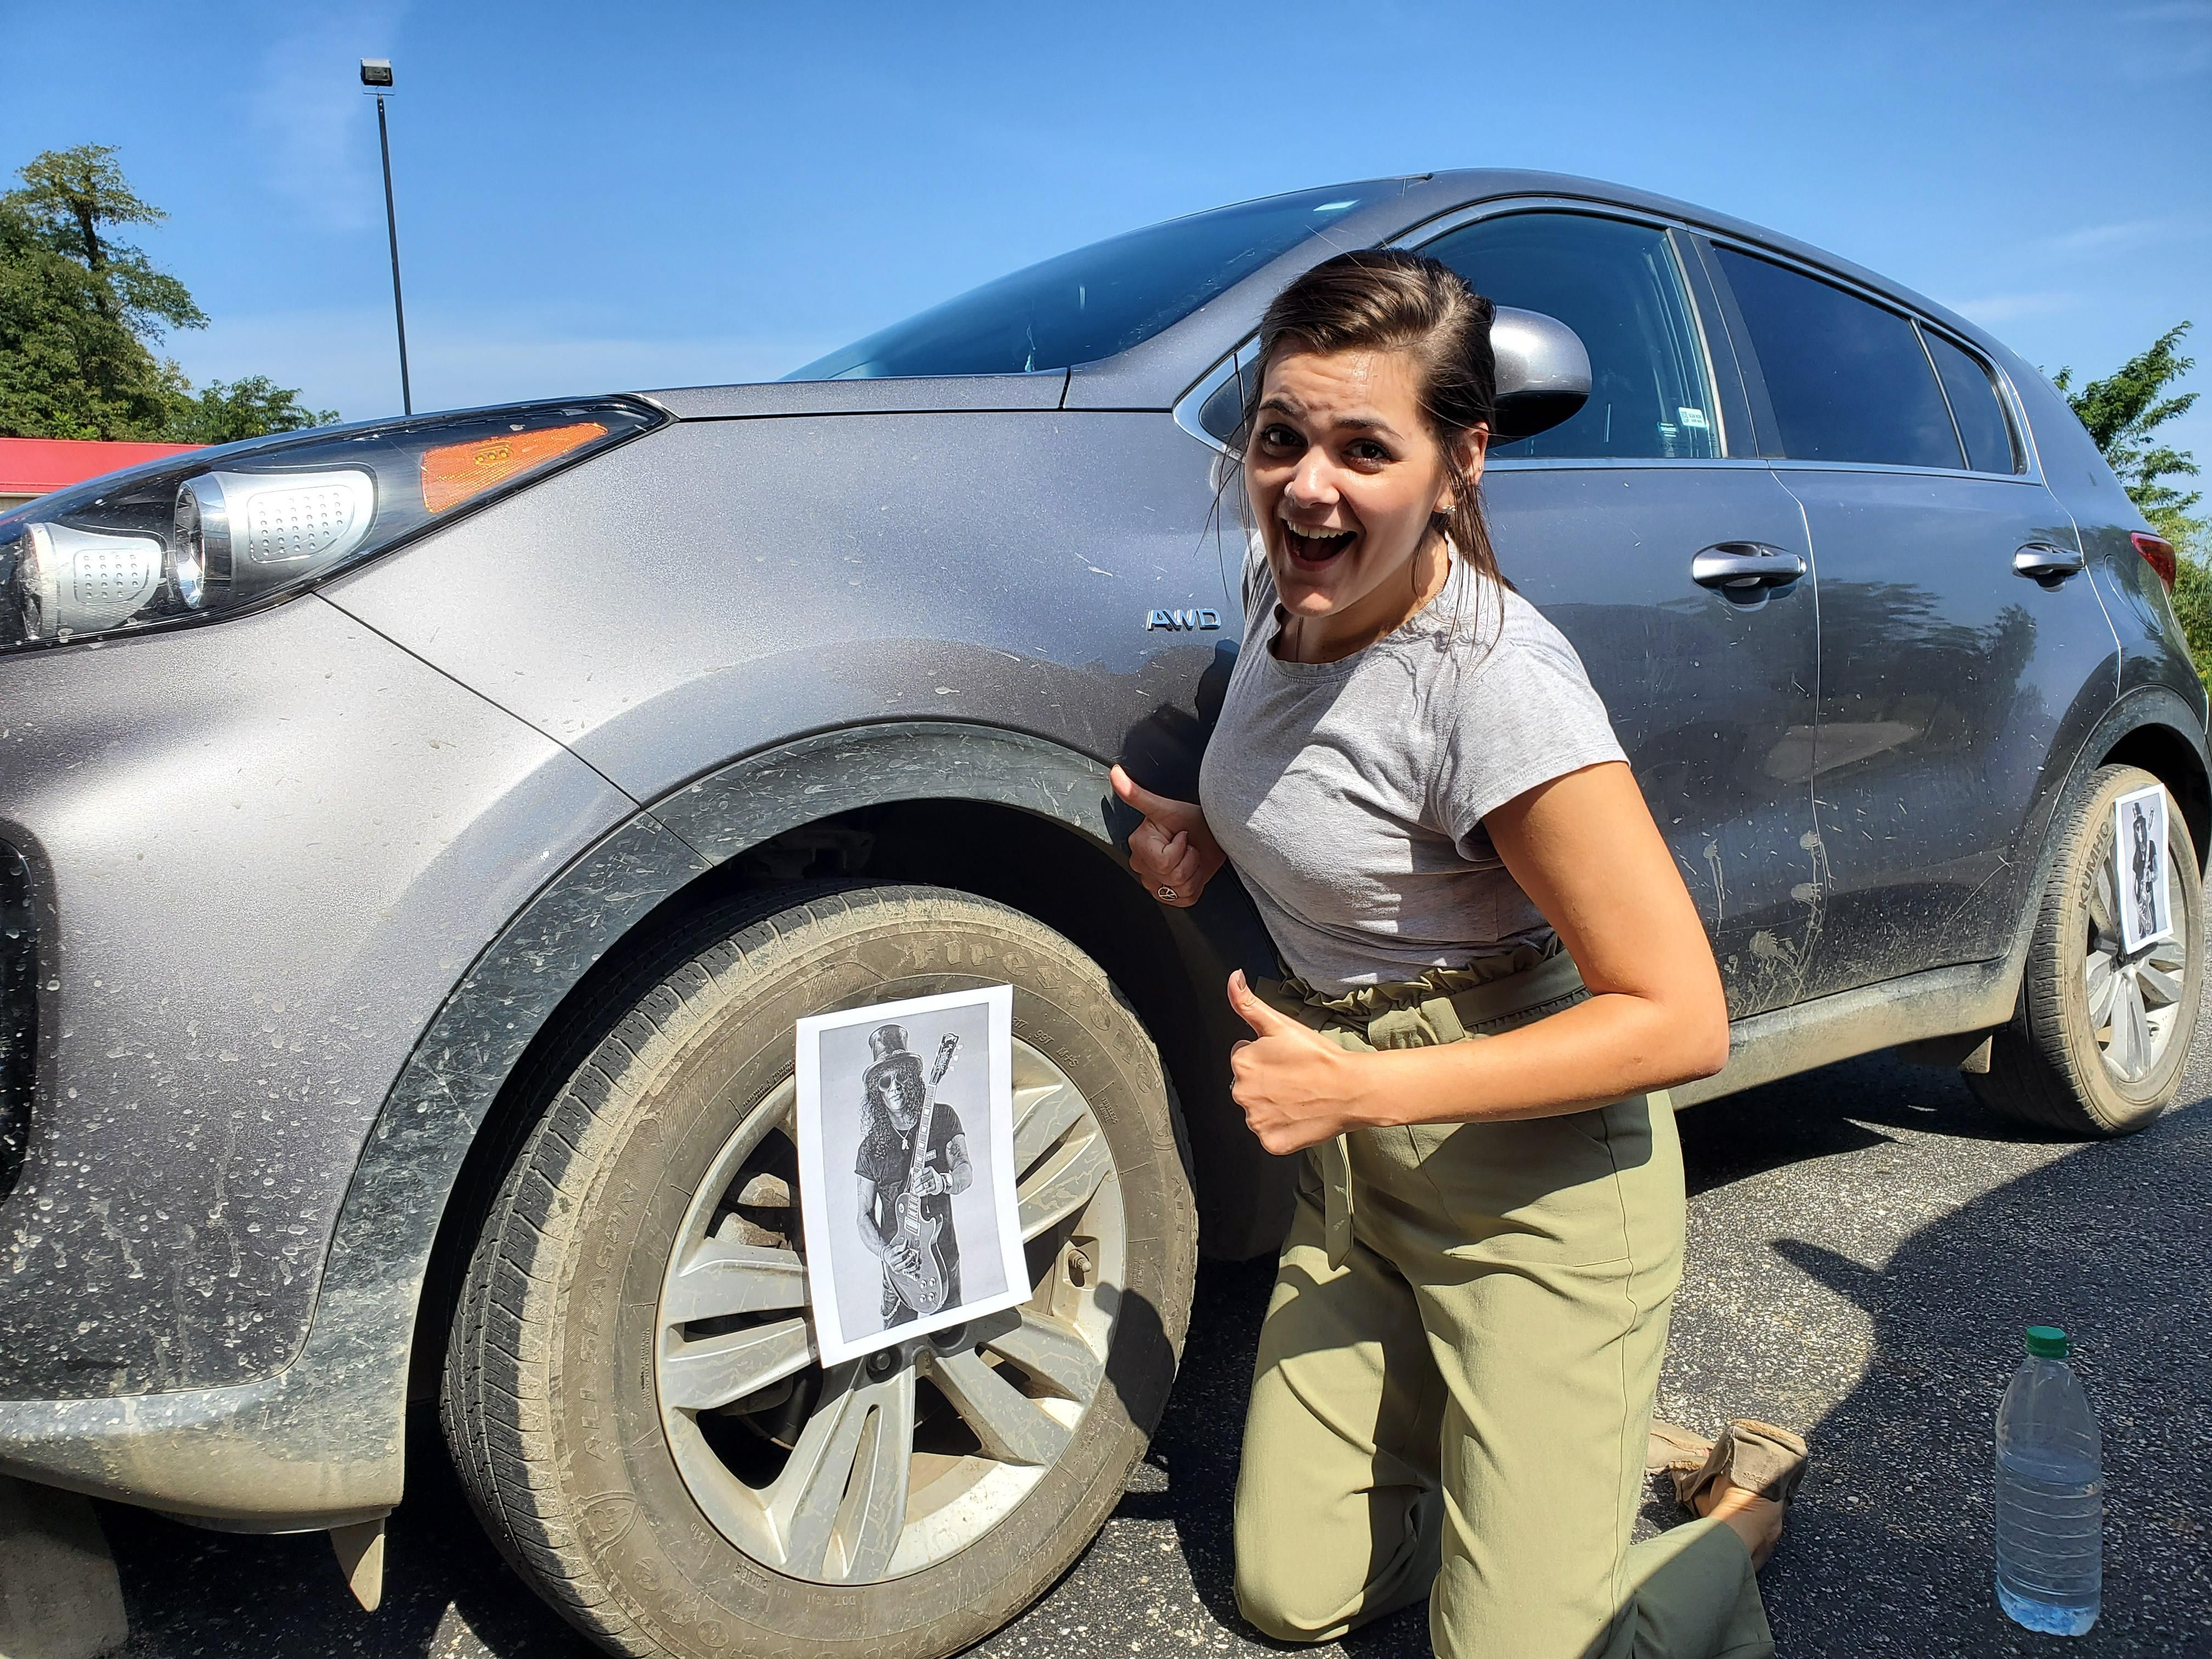 I Slashed My Co-Worker's Tires.